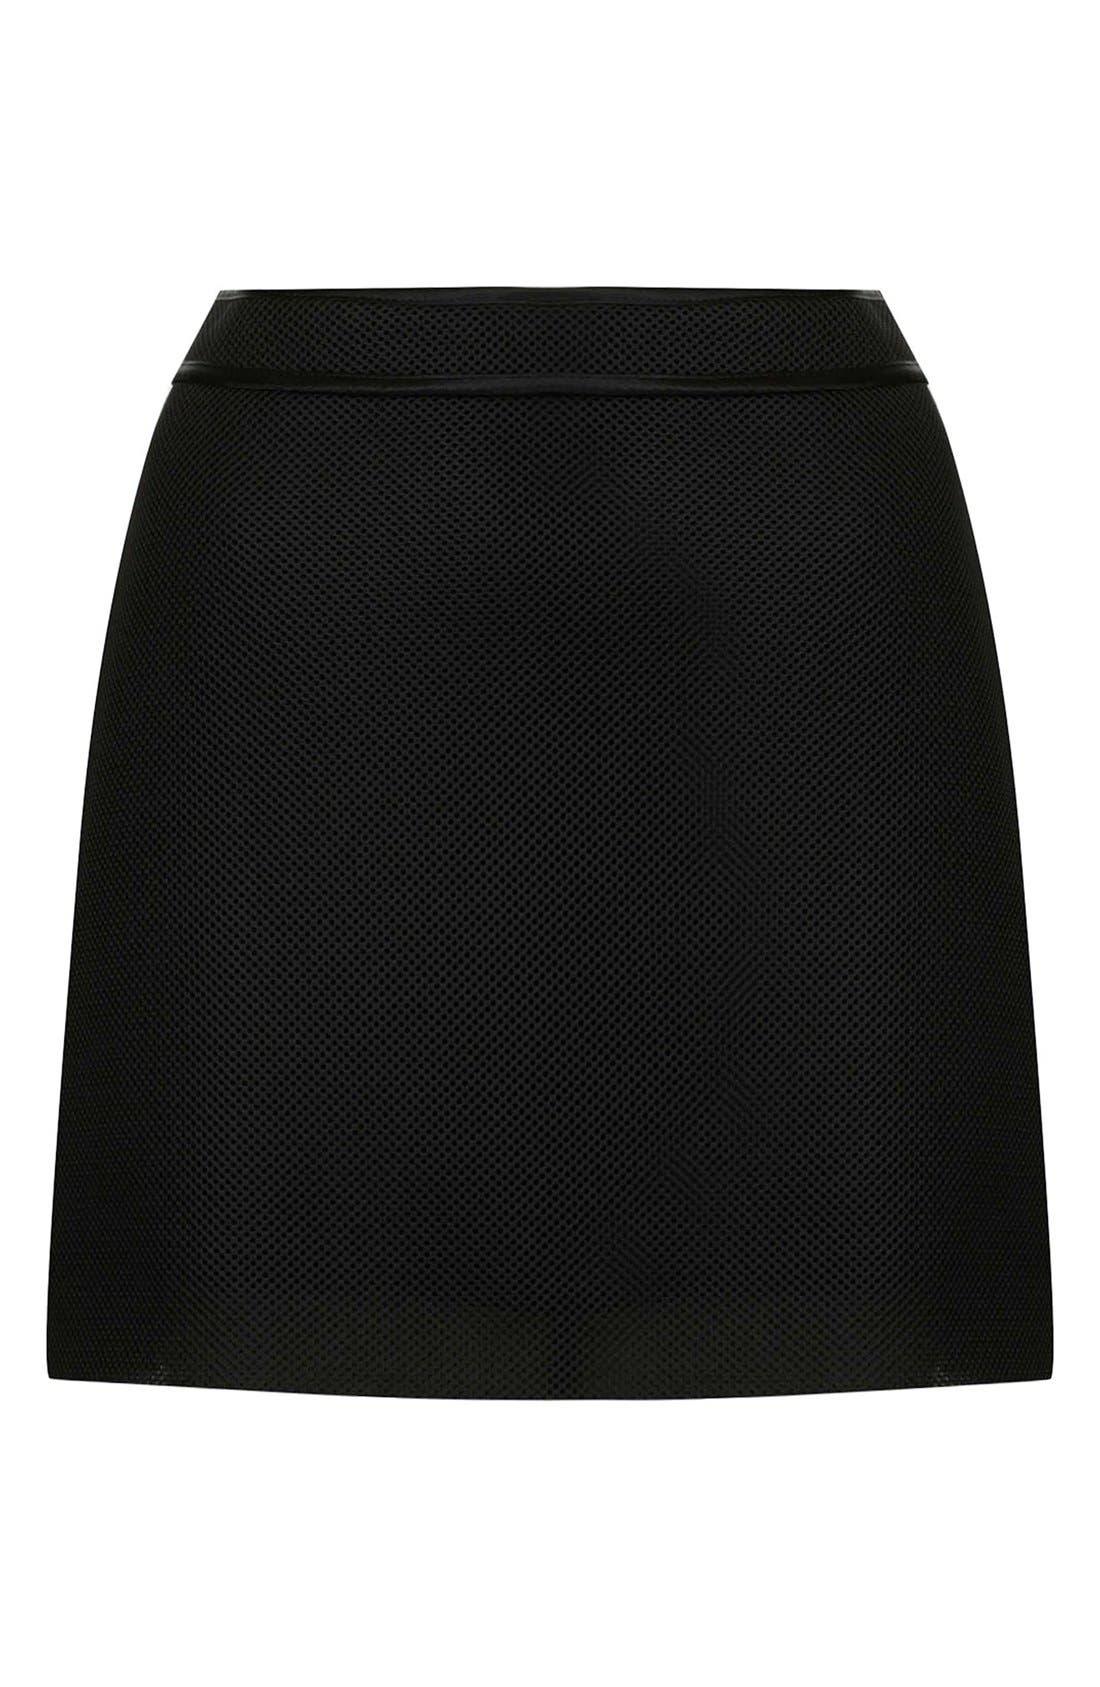 Alternate Image 3  - Topshop Airtex Miniskirt